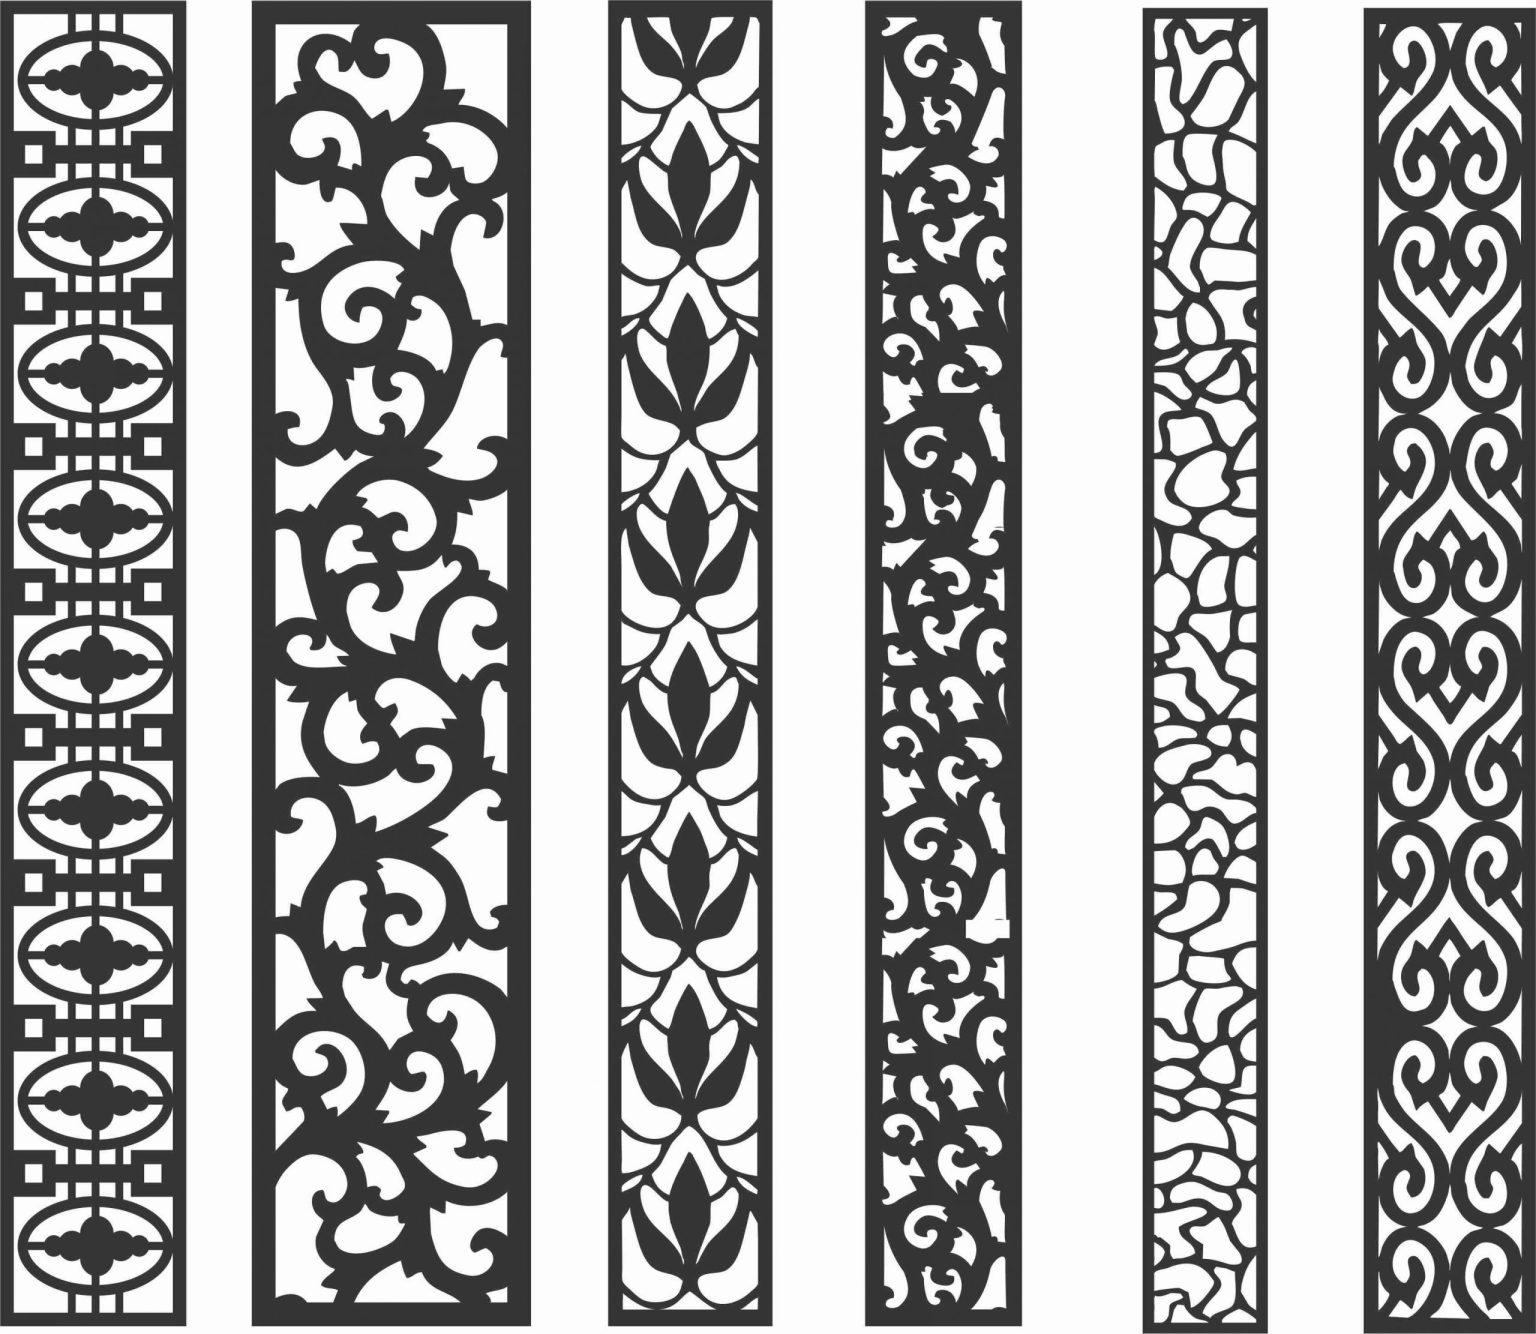 Screen Panel Patterns Seamless 38 Free DXF File